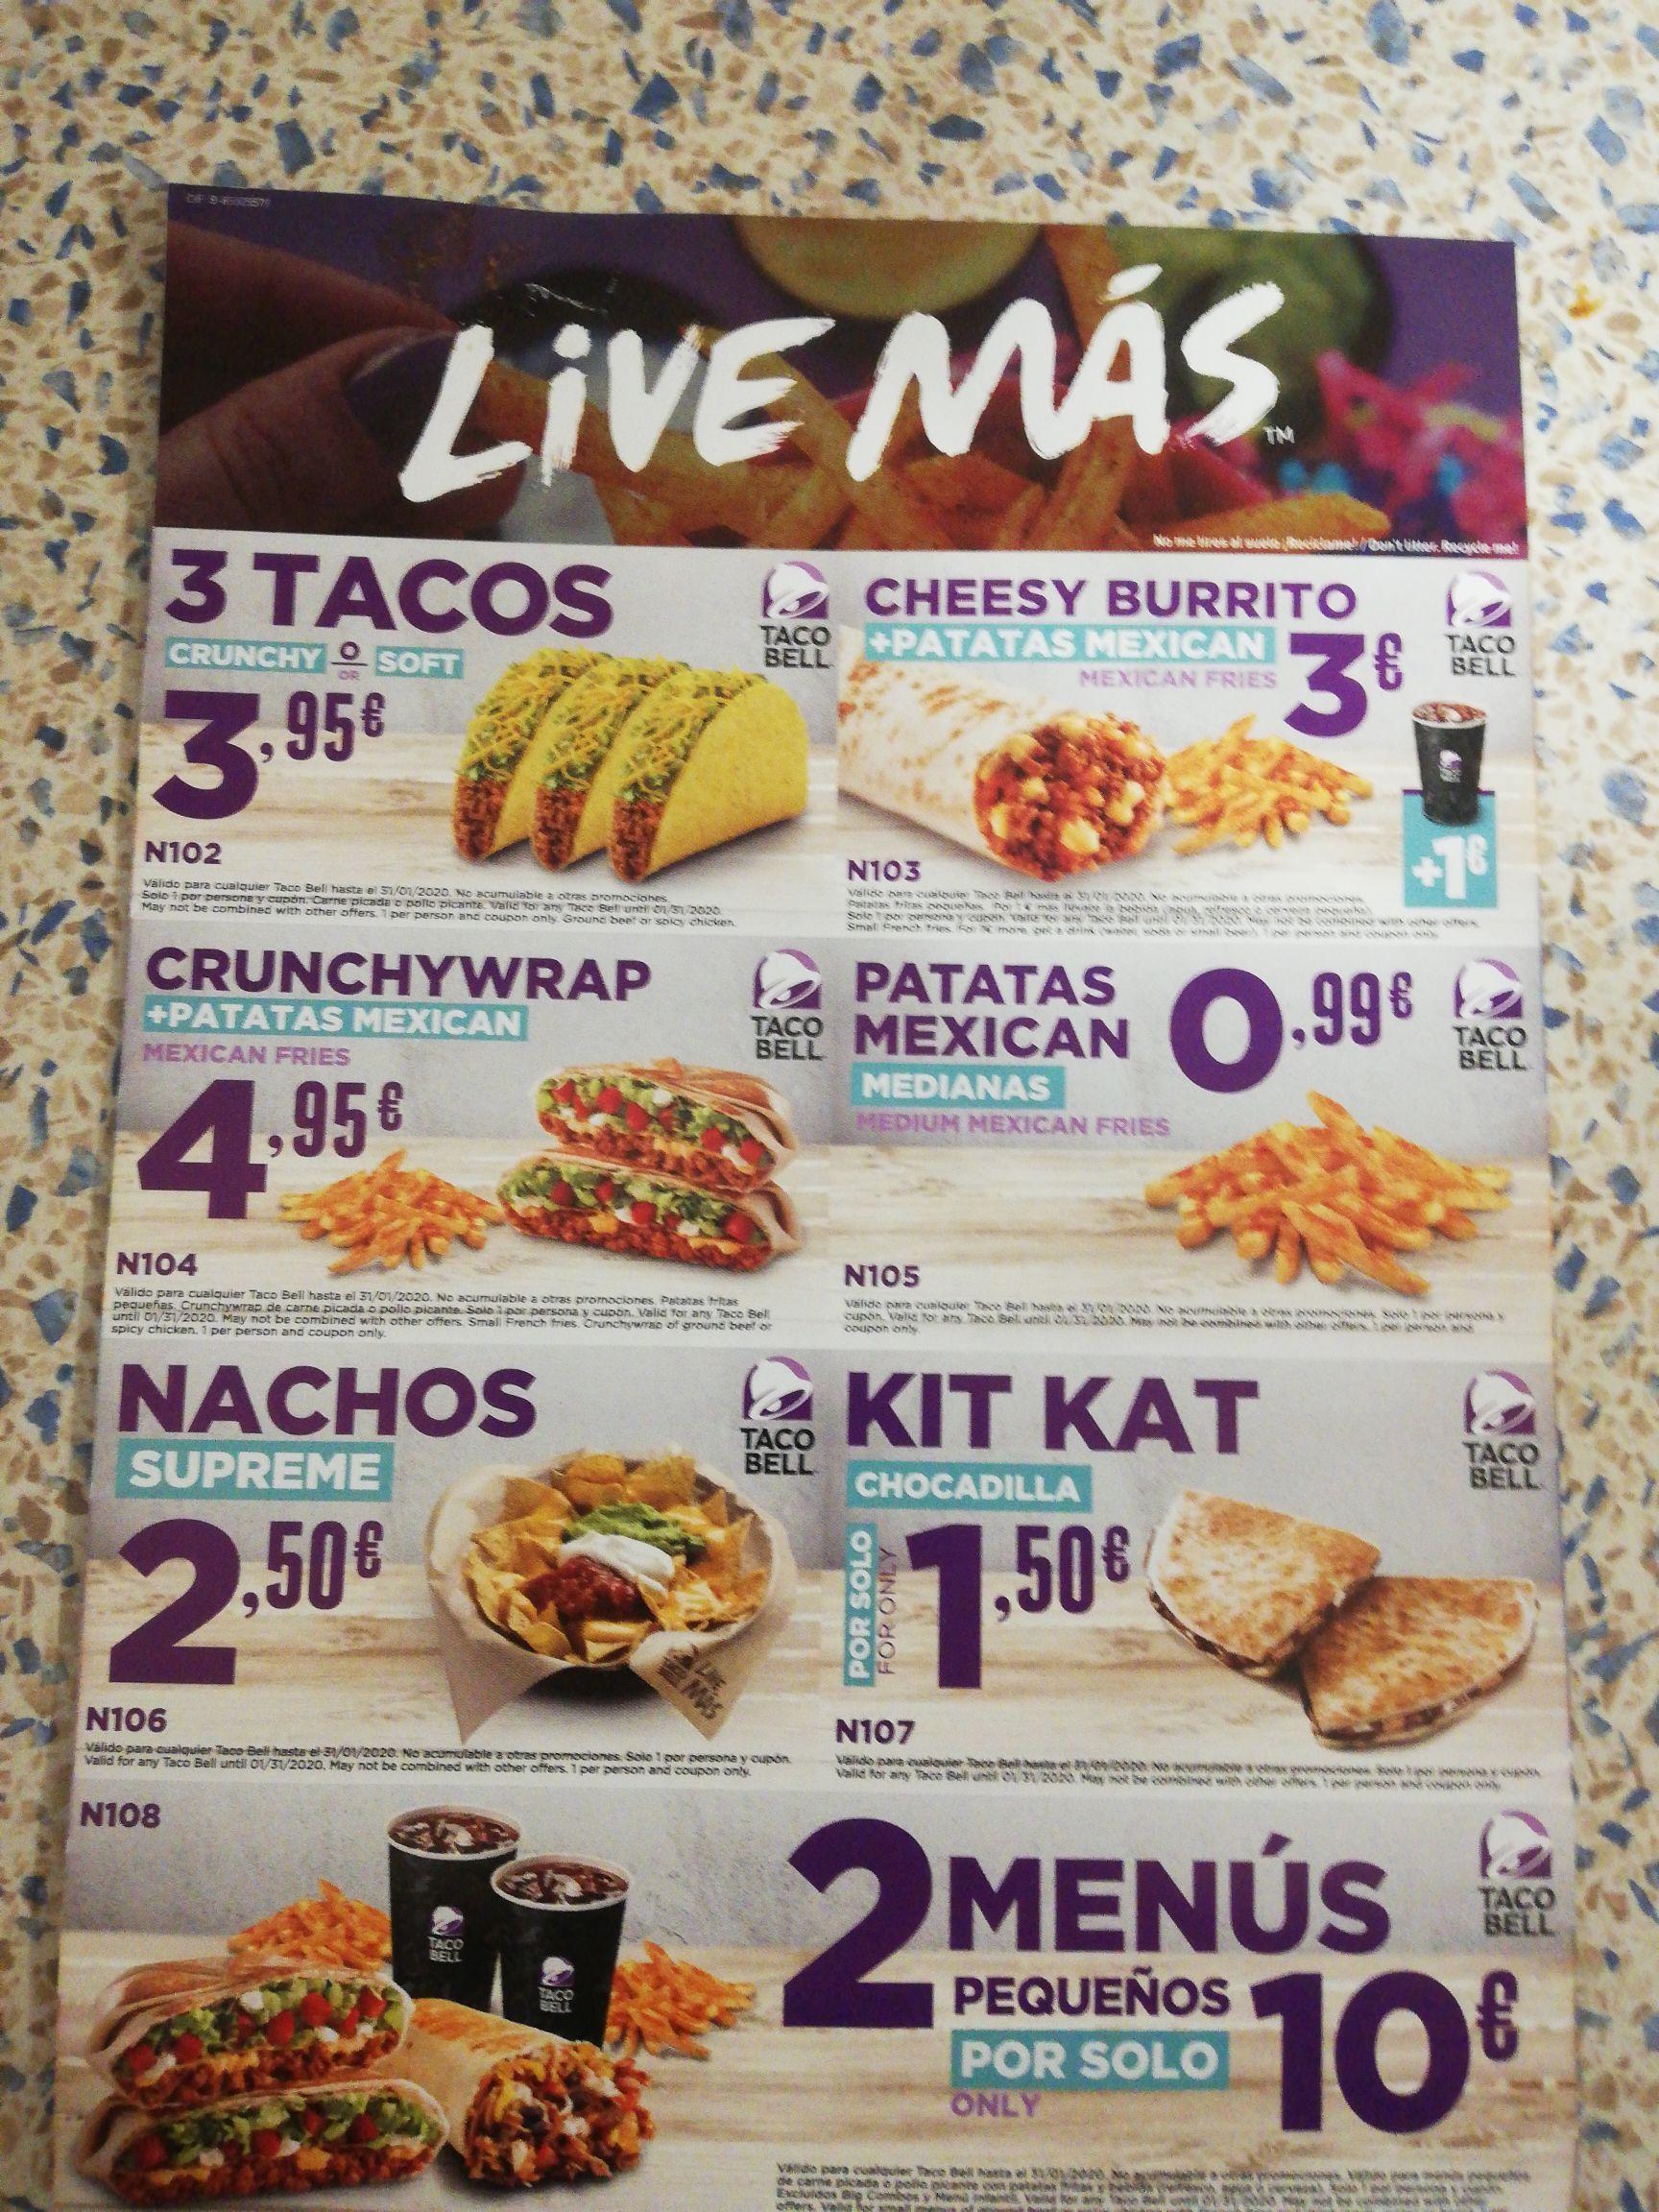 Taco bell ofertas